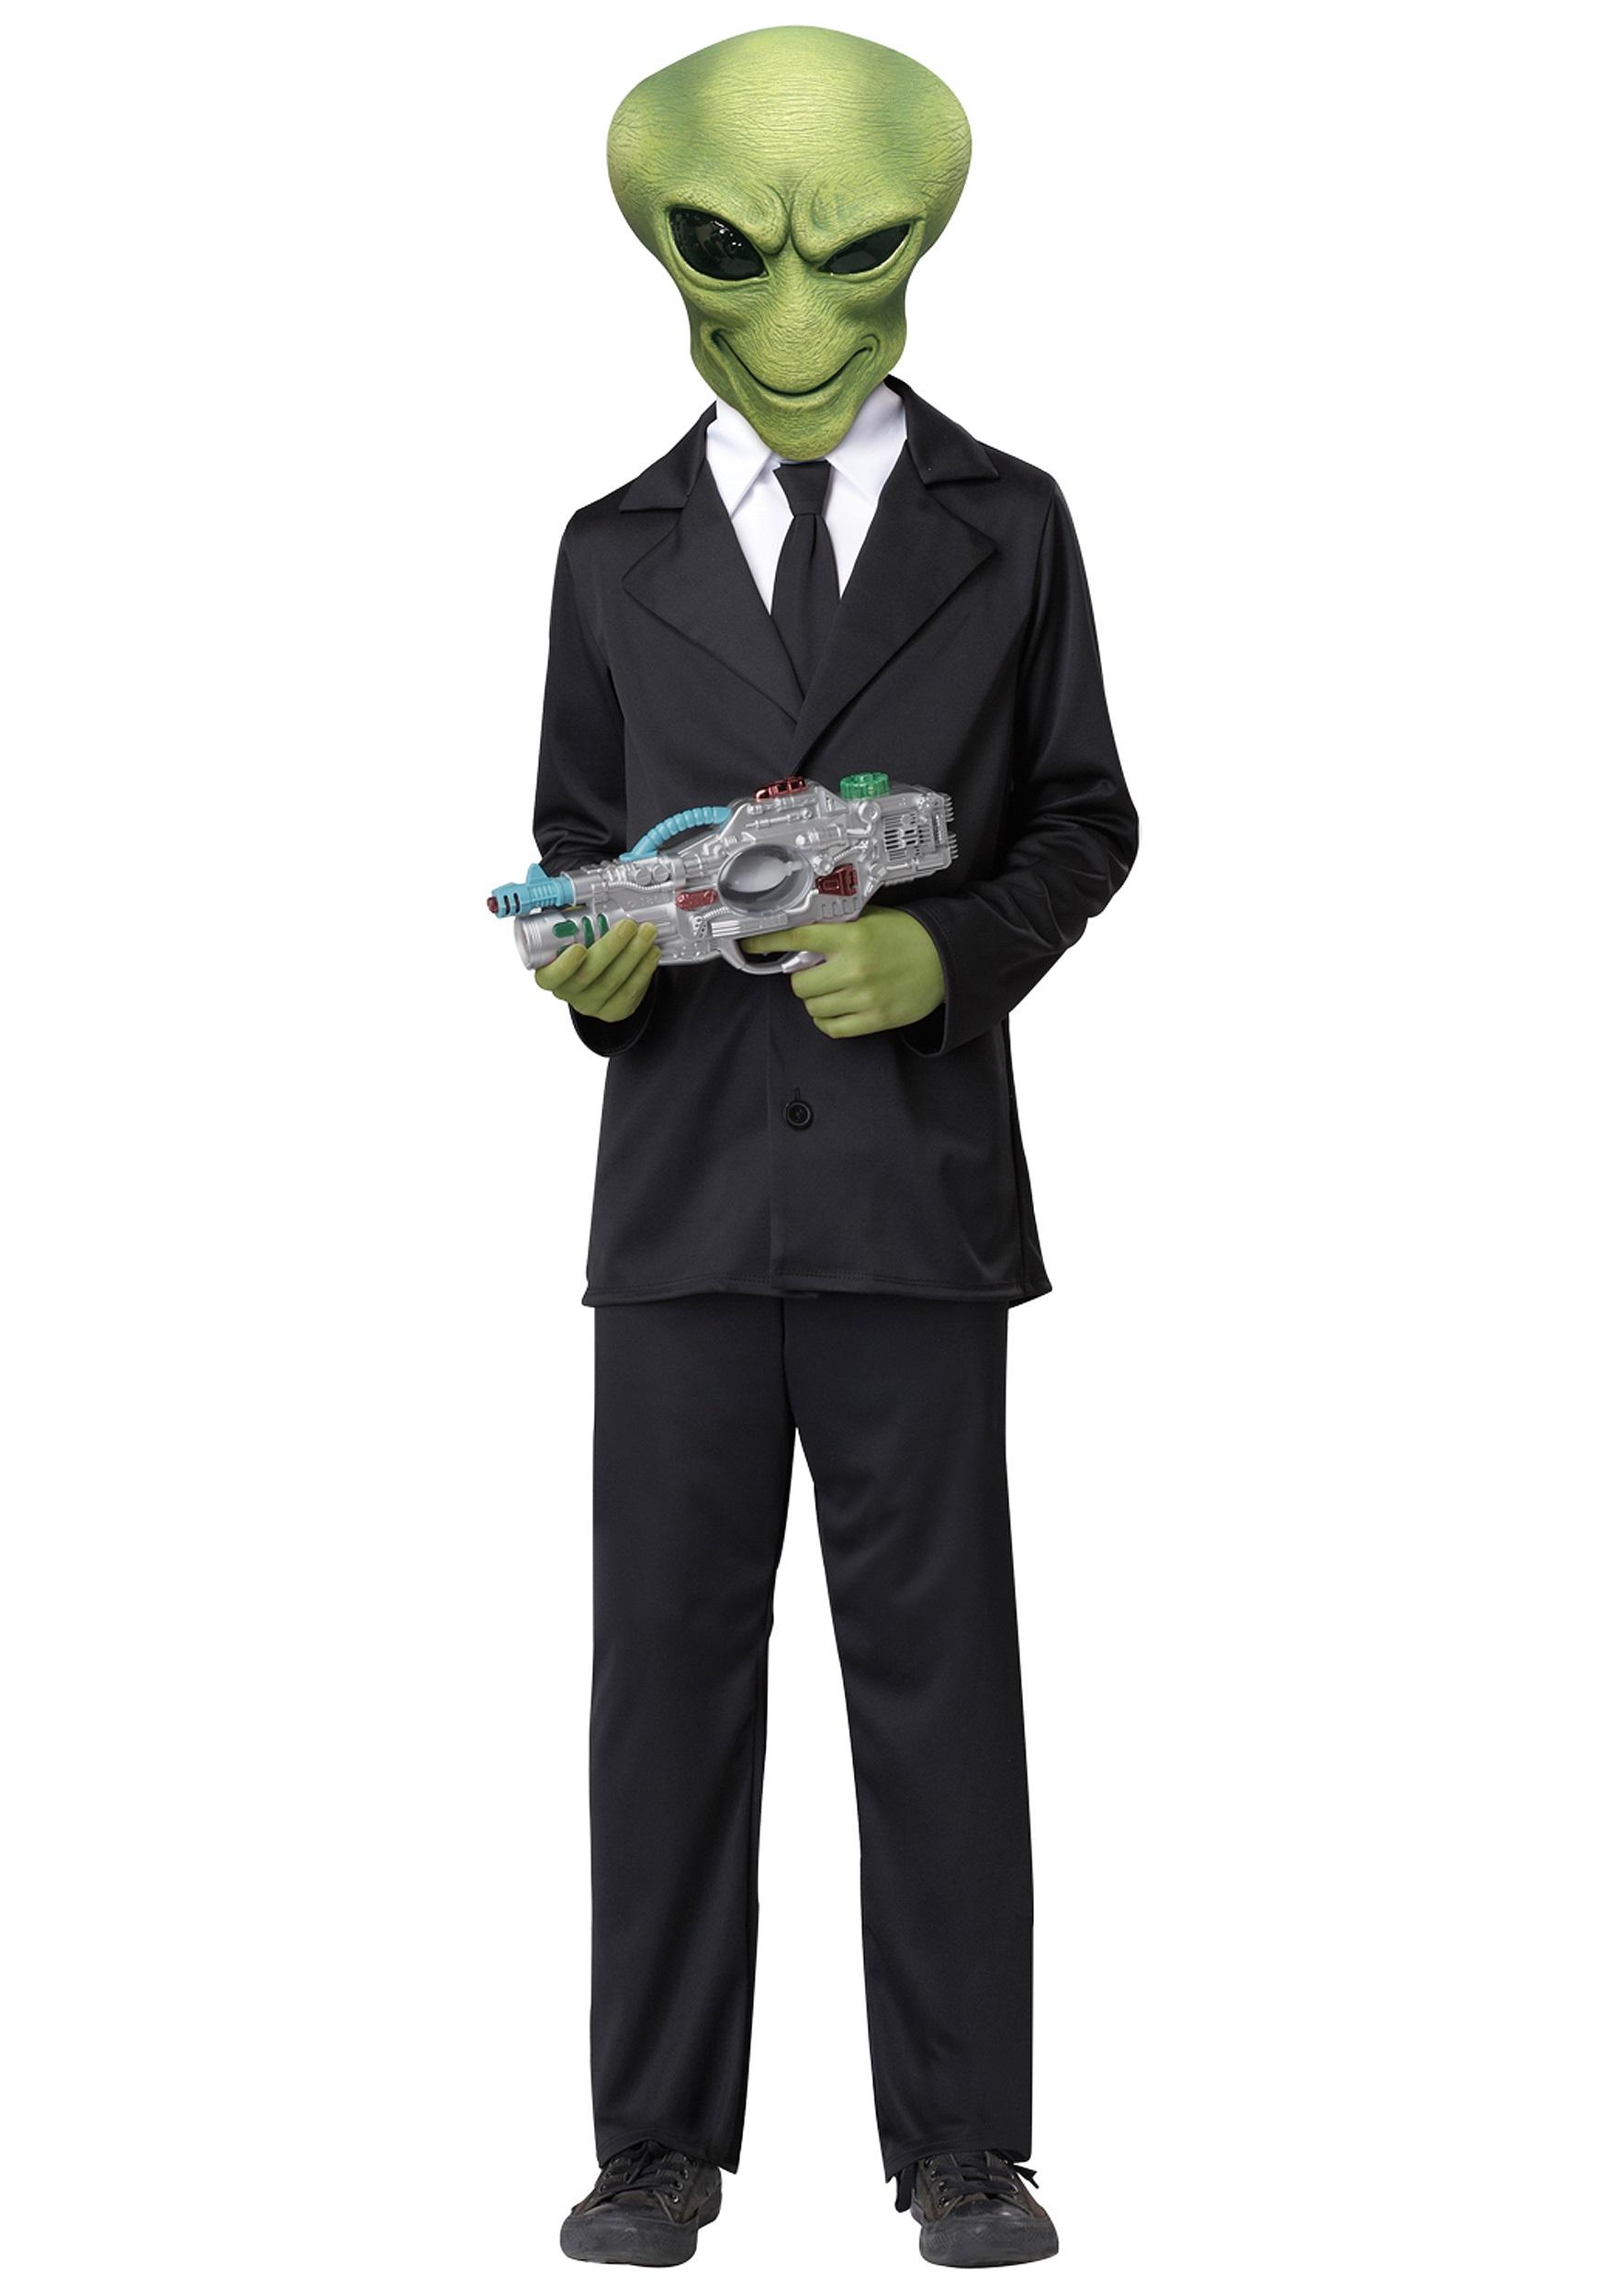 Alien Agent Costume  sc 1 st  Halloween Costumes & Alien Agent Costume - Halloween Costumes